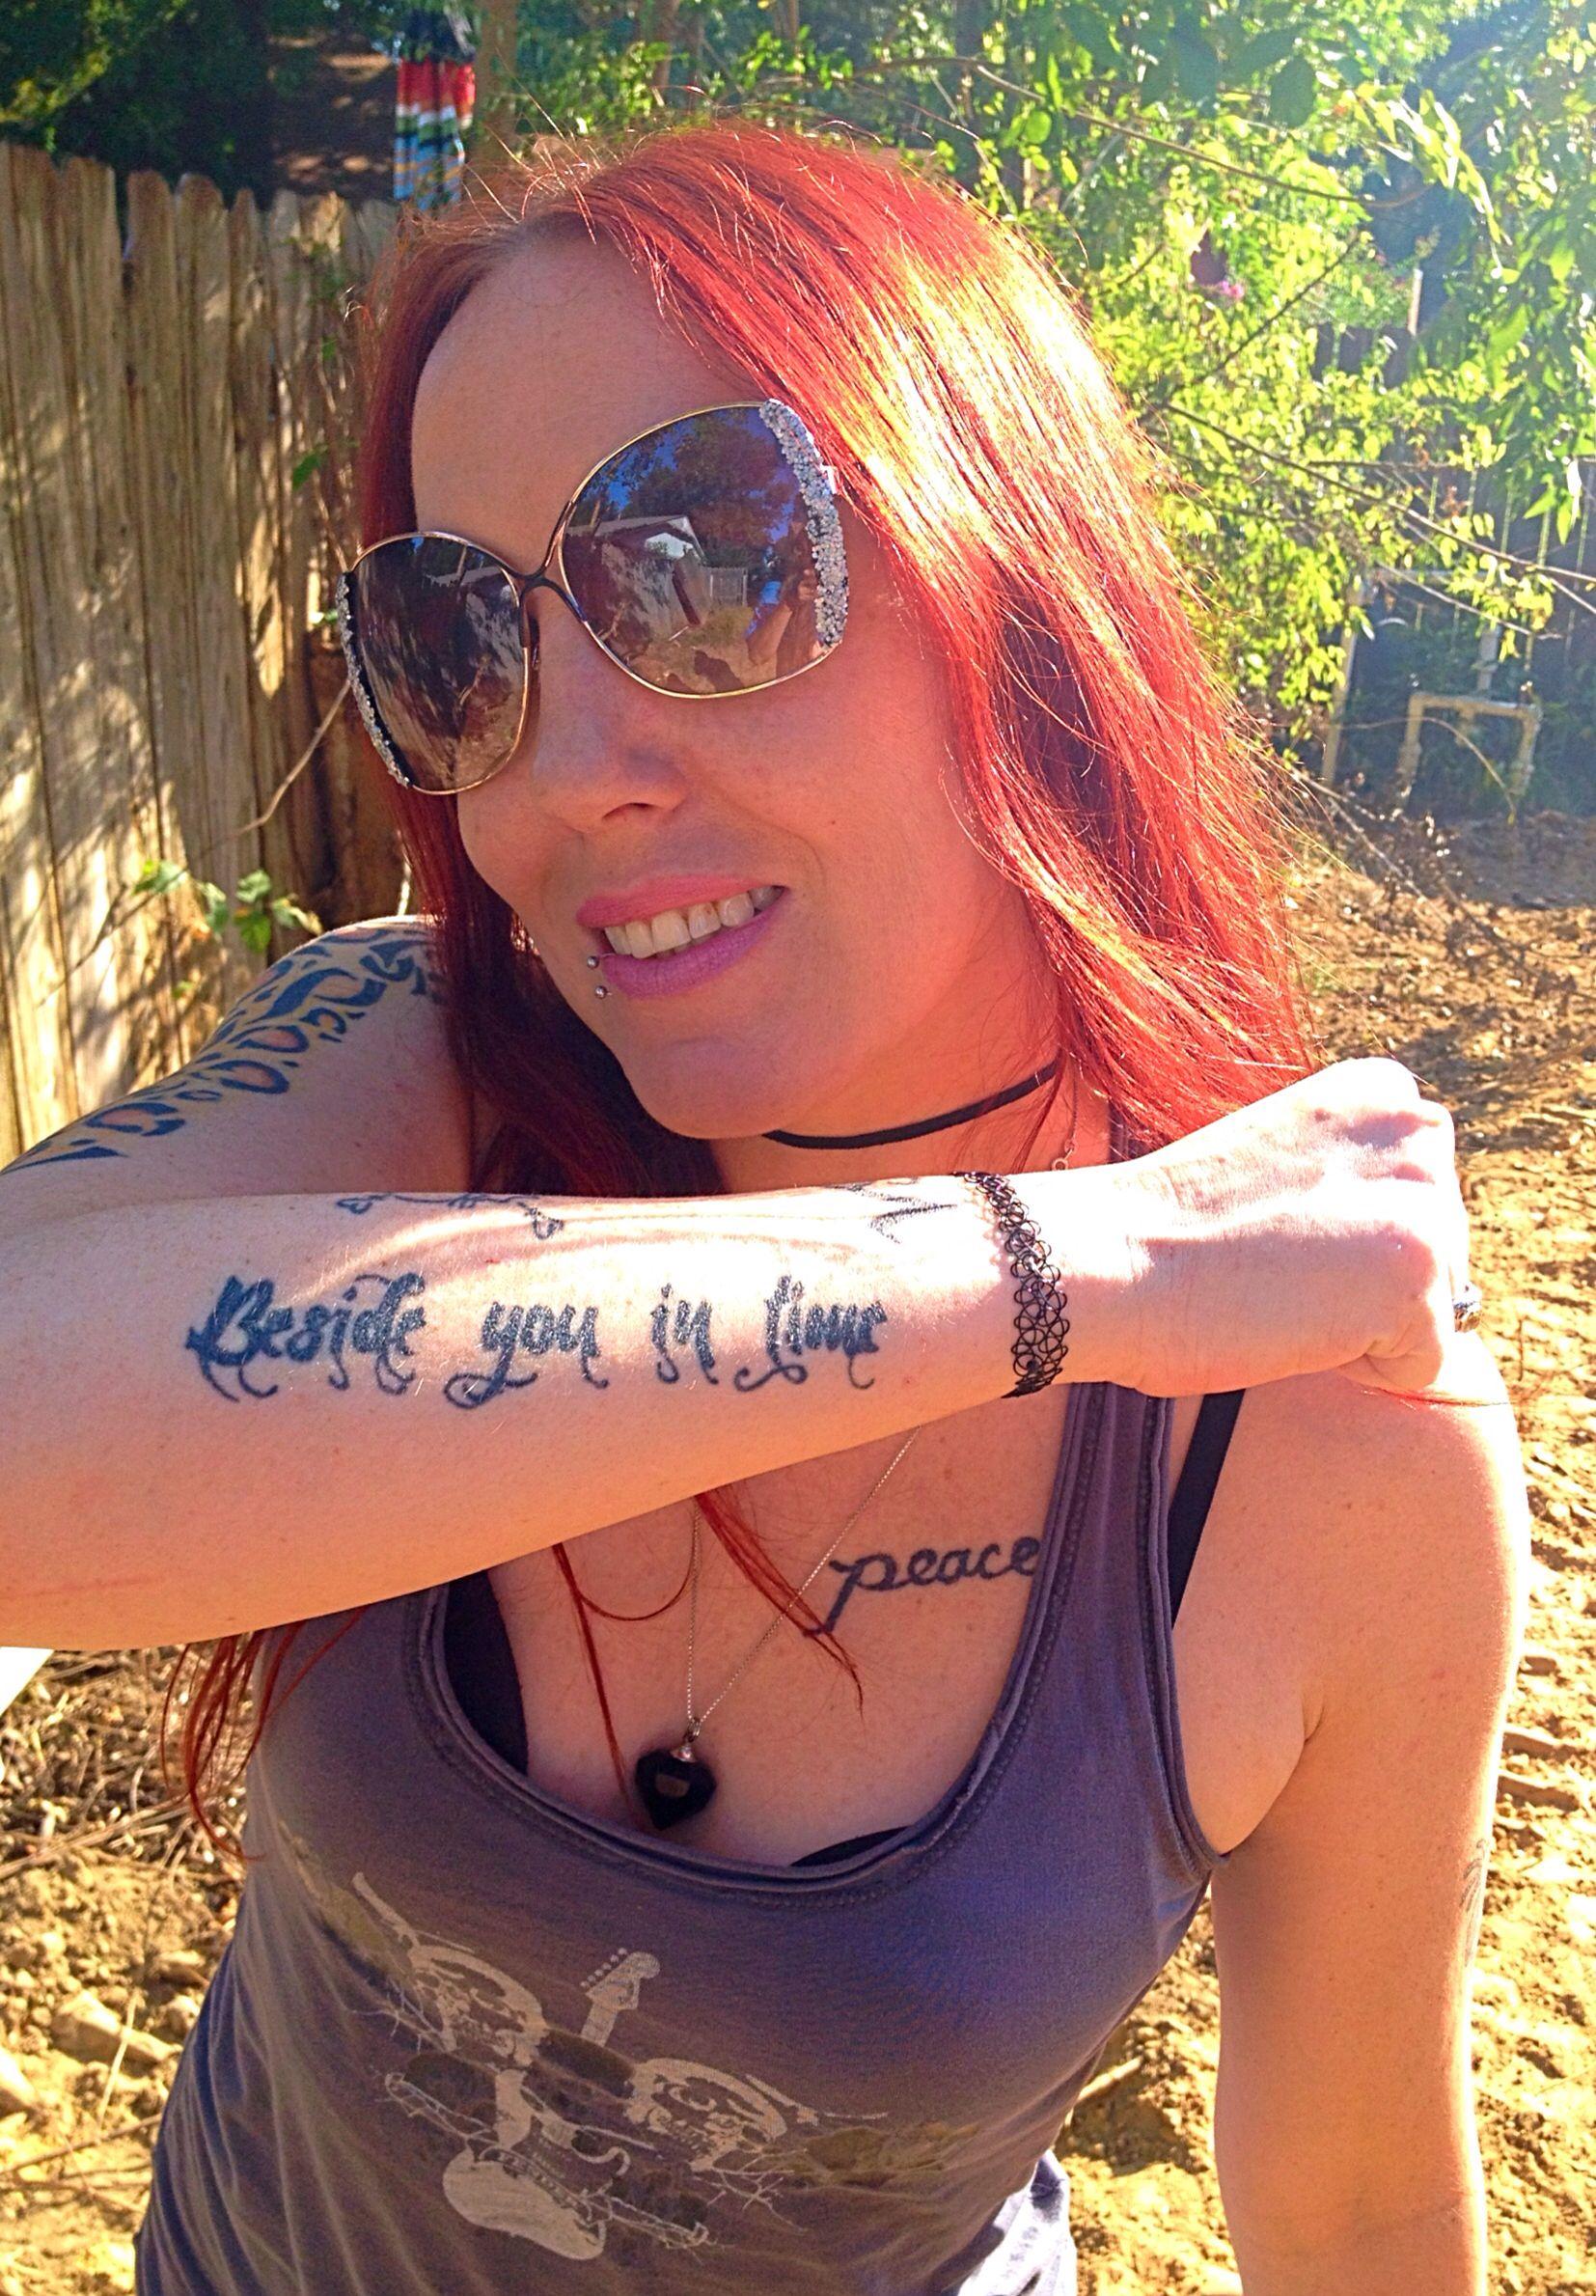 My Nine Inch Nails tat. (For my mama). | MUSIC | Pinterest | Tatting ...